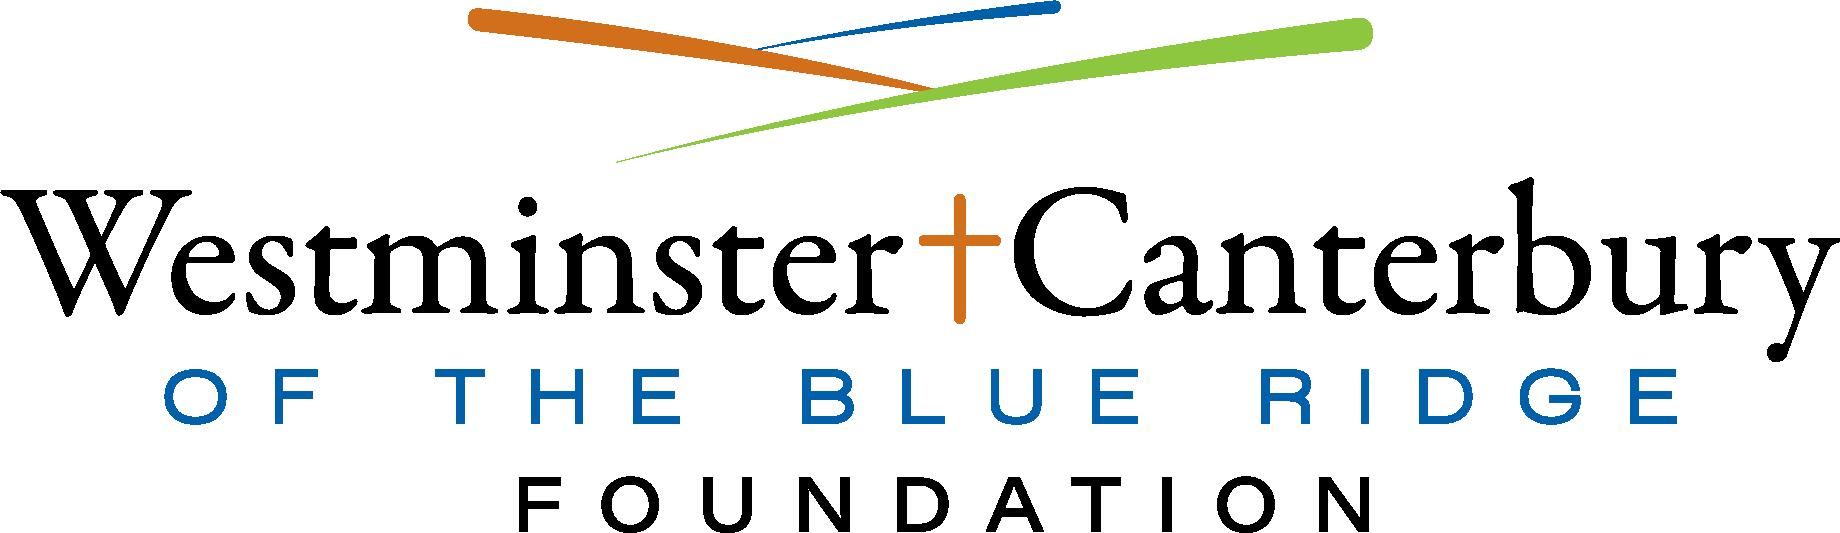 WCBR_Foundation_logo